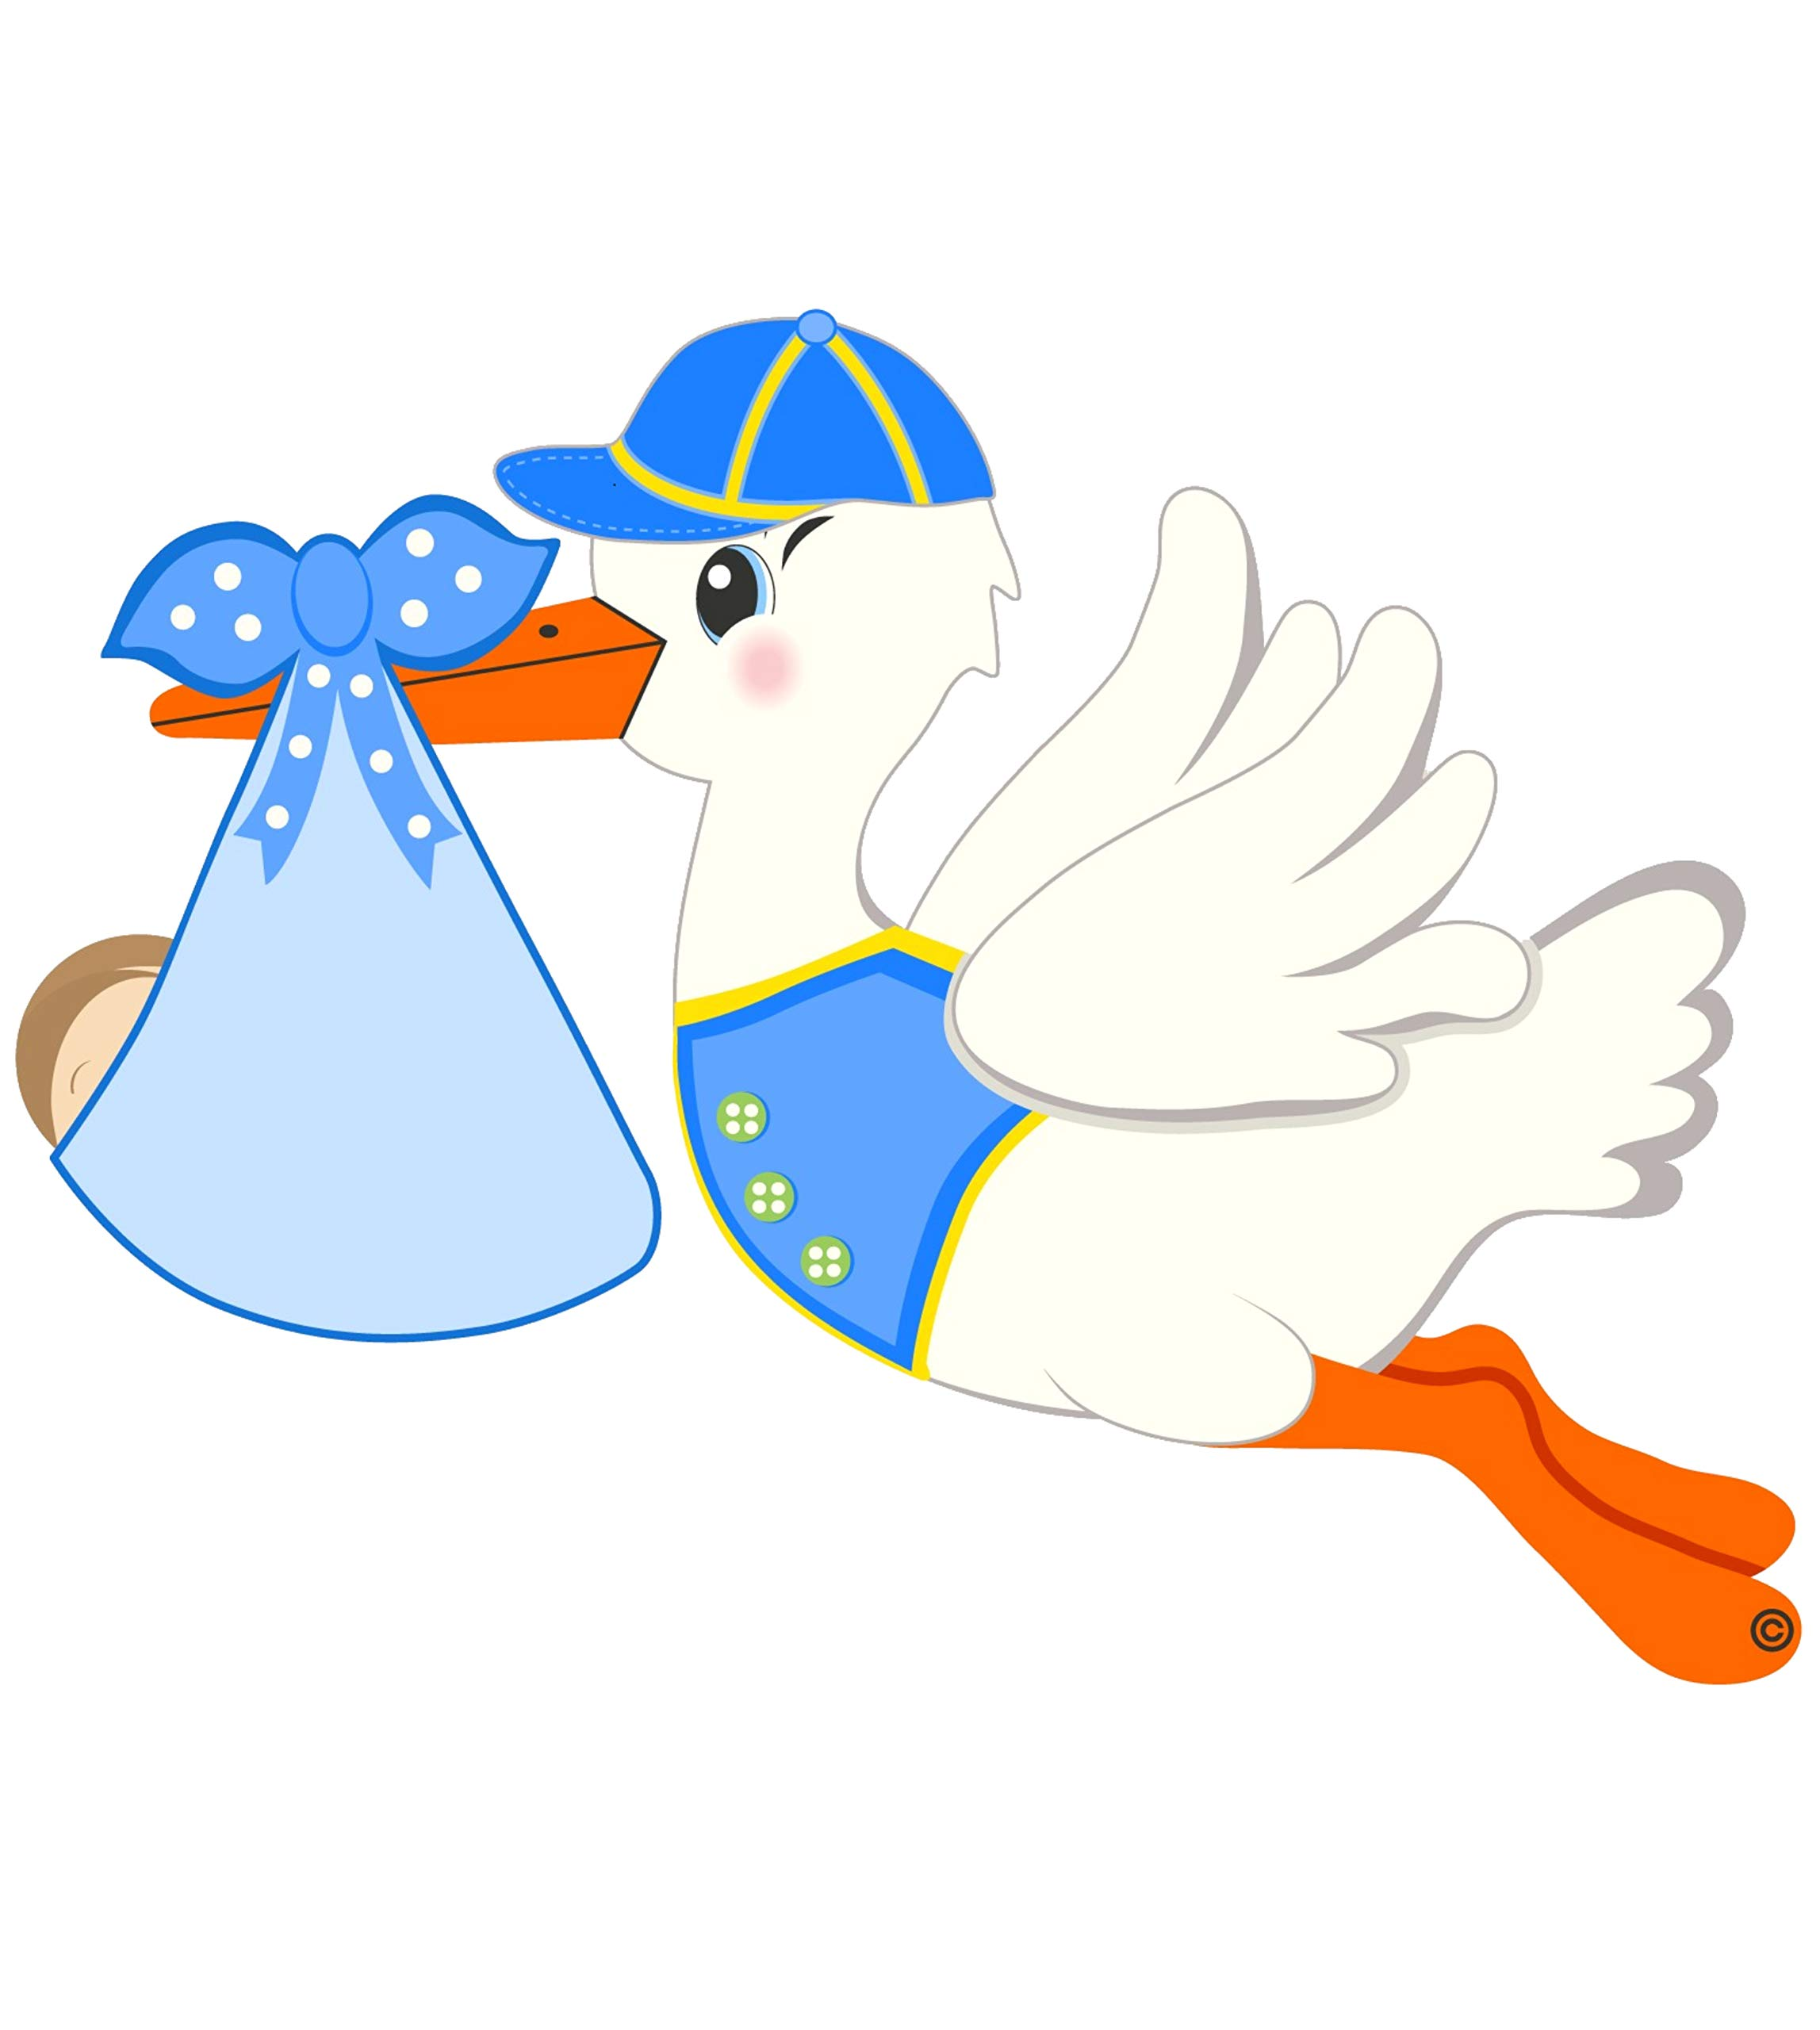 Cute News It's a Boy Stork Announcement Door Hanger - Nursery Wall Decoration - Blue - Indoor or Outdoor Baby Decoration